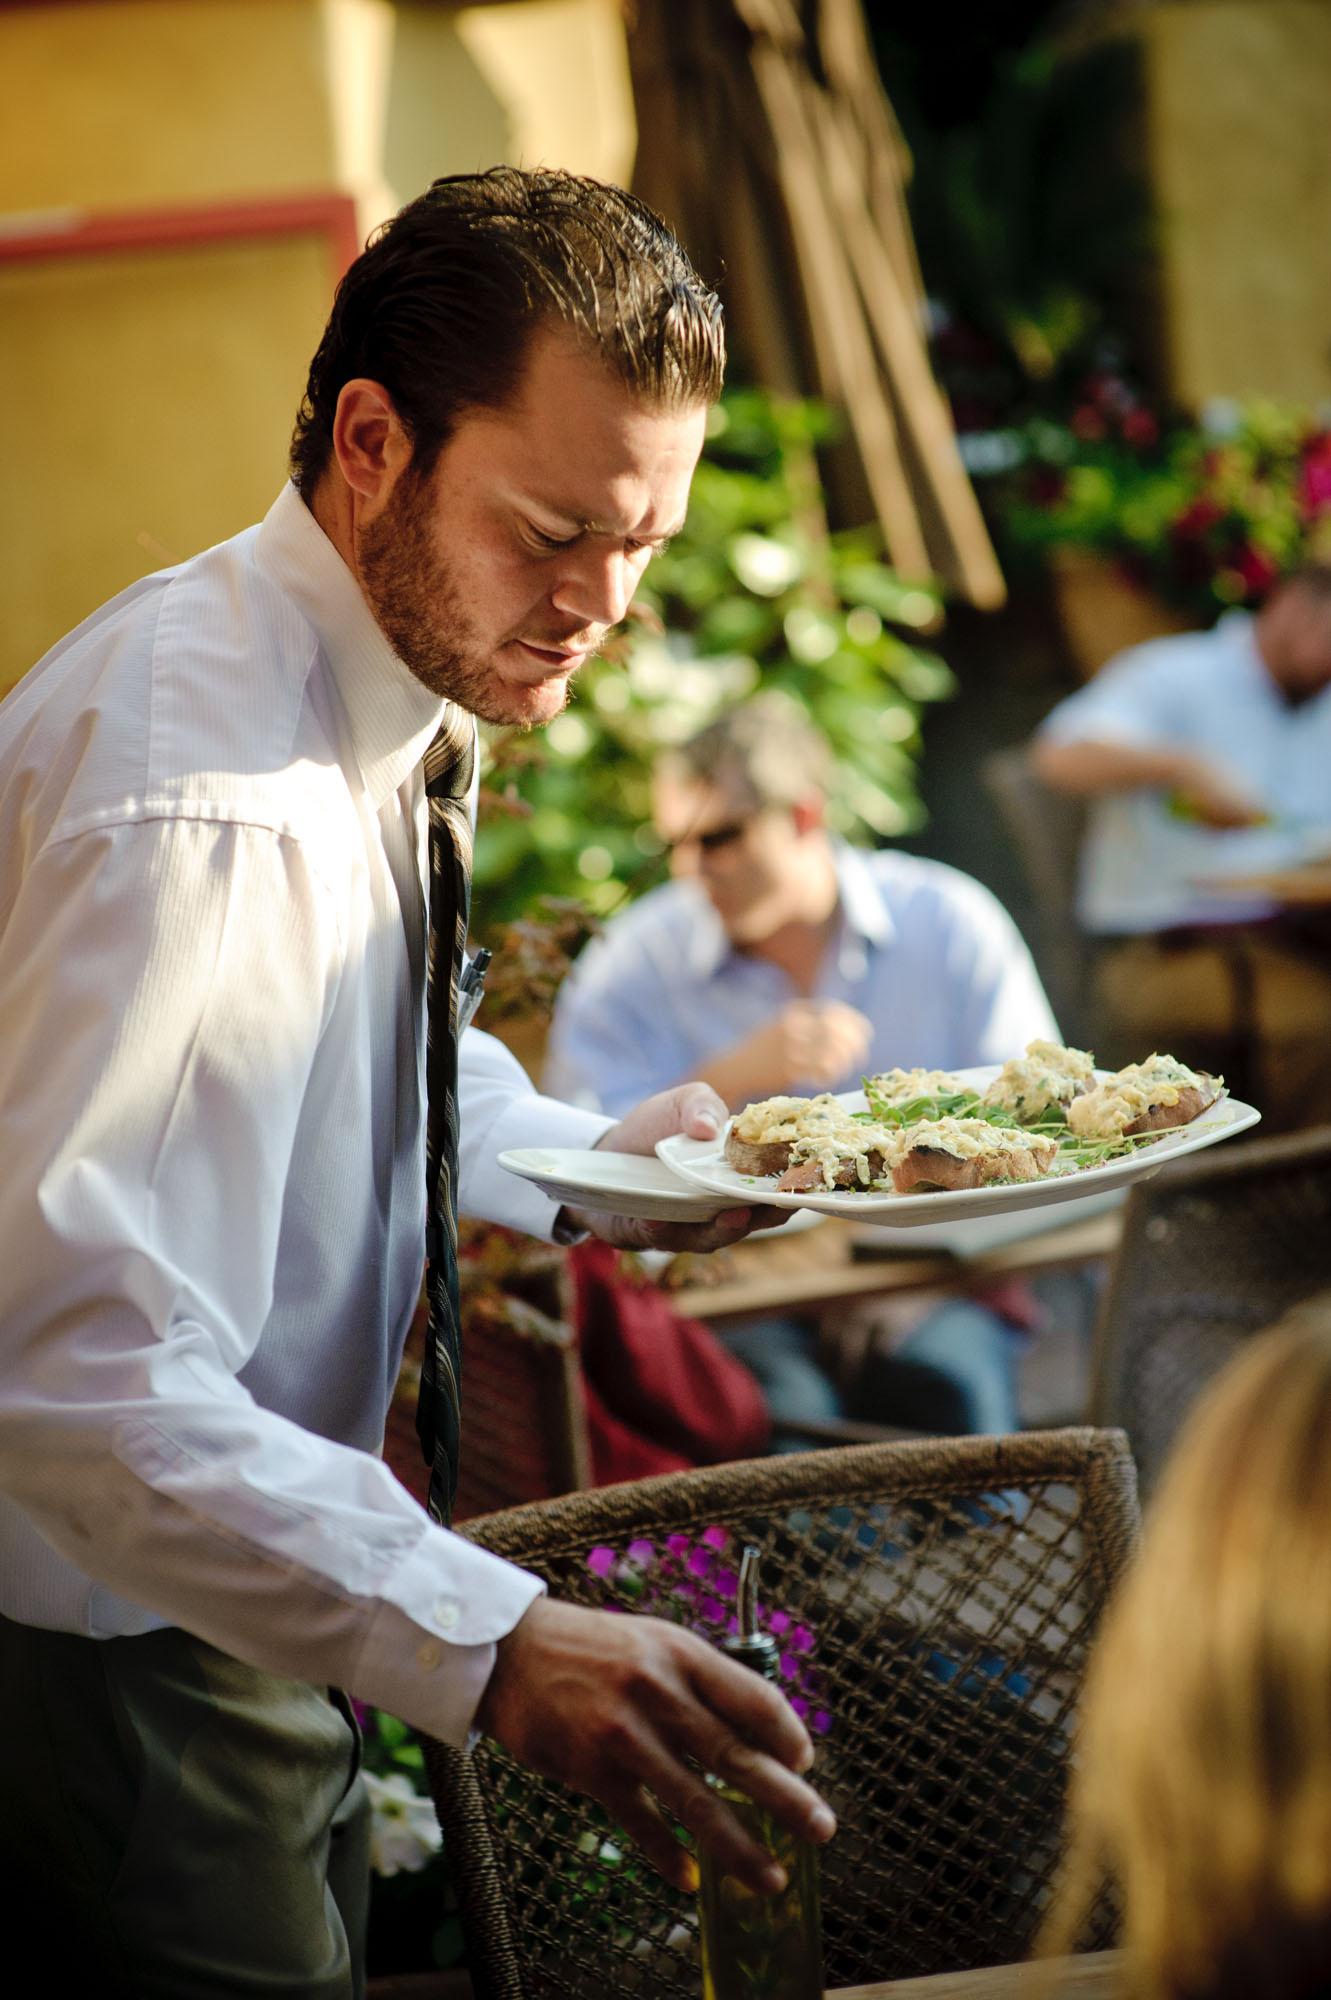 9236-d700_Cafe_Cruz_Staff_etc_Soquel_Restaurant_Photography.jpg